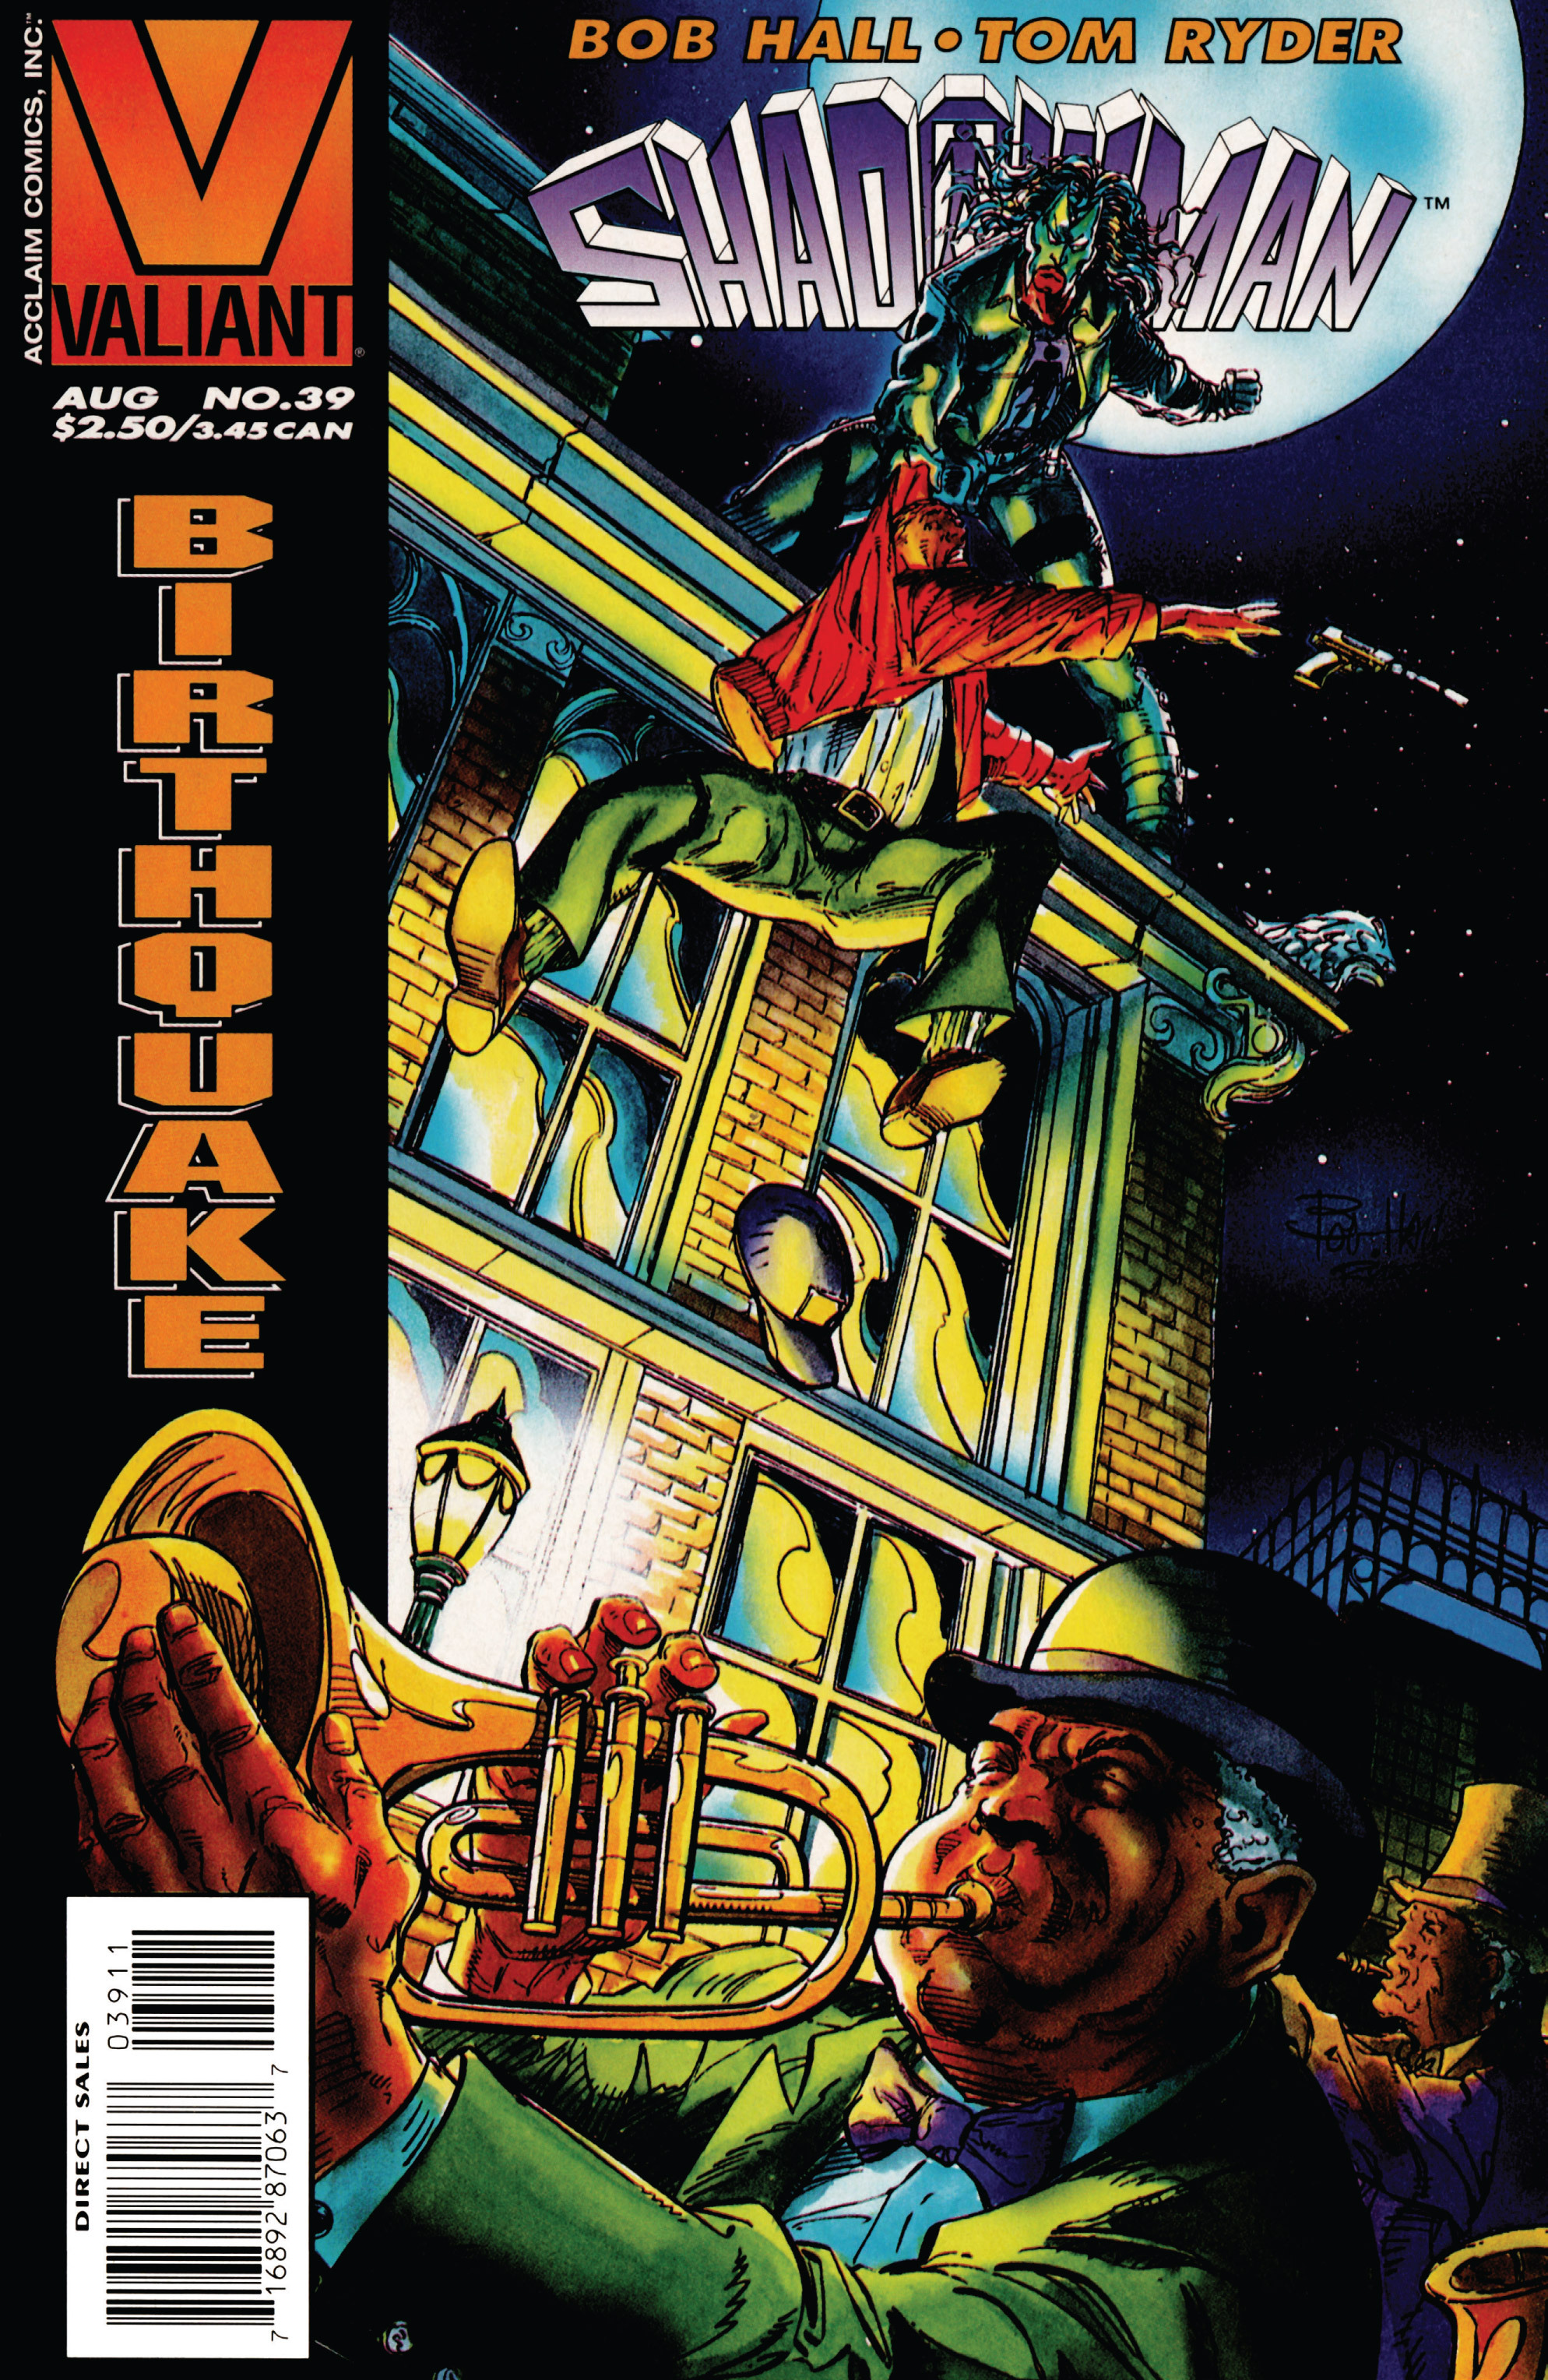 Read online Shadowman (1992) comic -  Issue #39 - 1